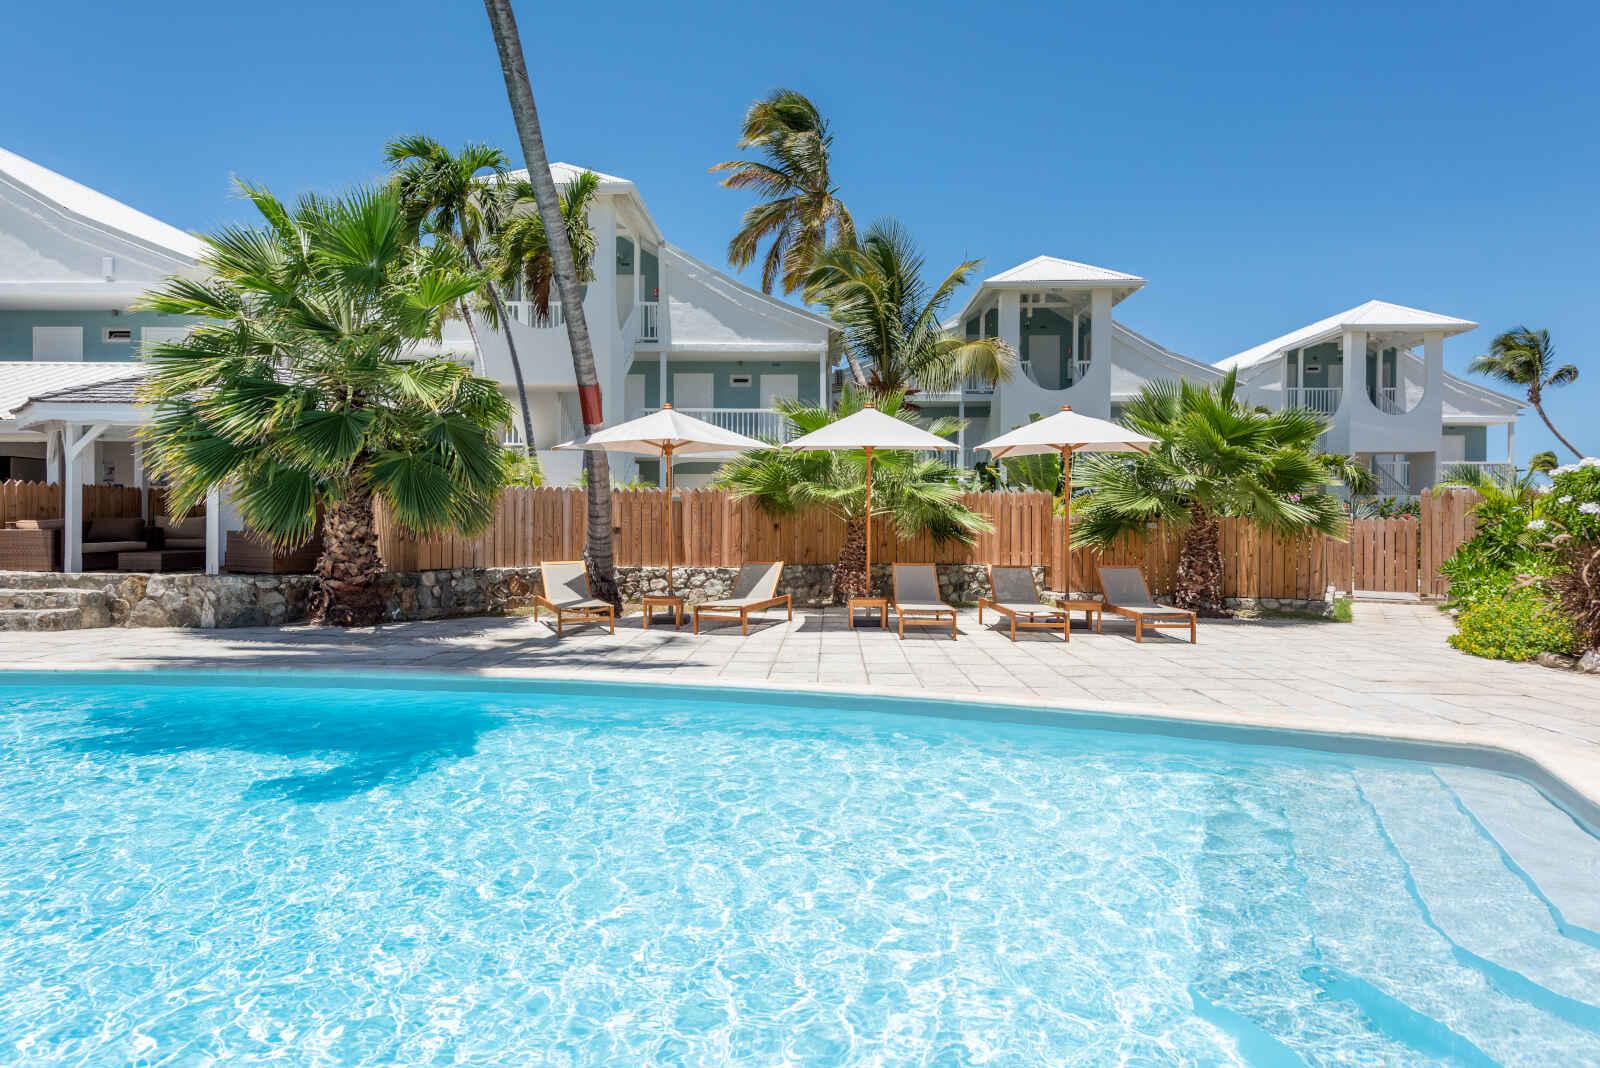 Saint Martin : La Playa Orient Bay